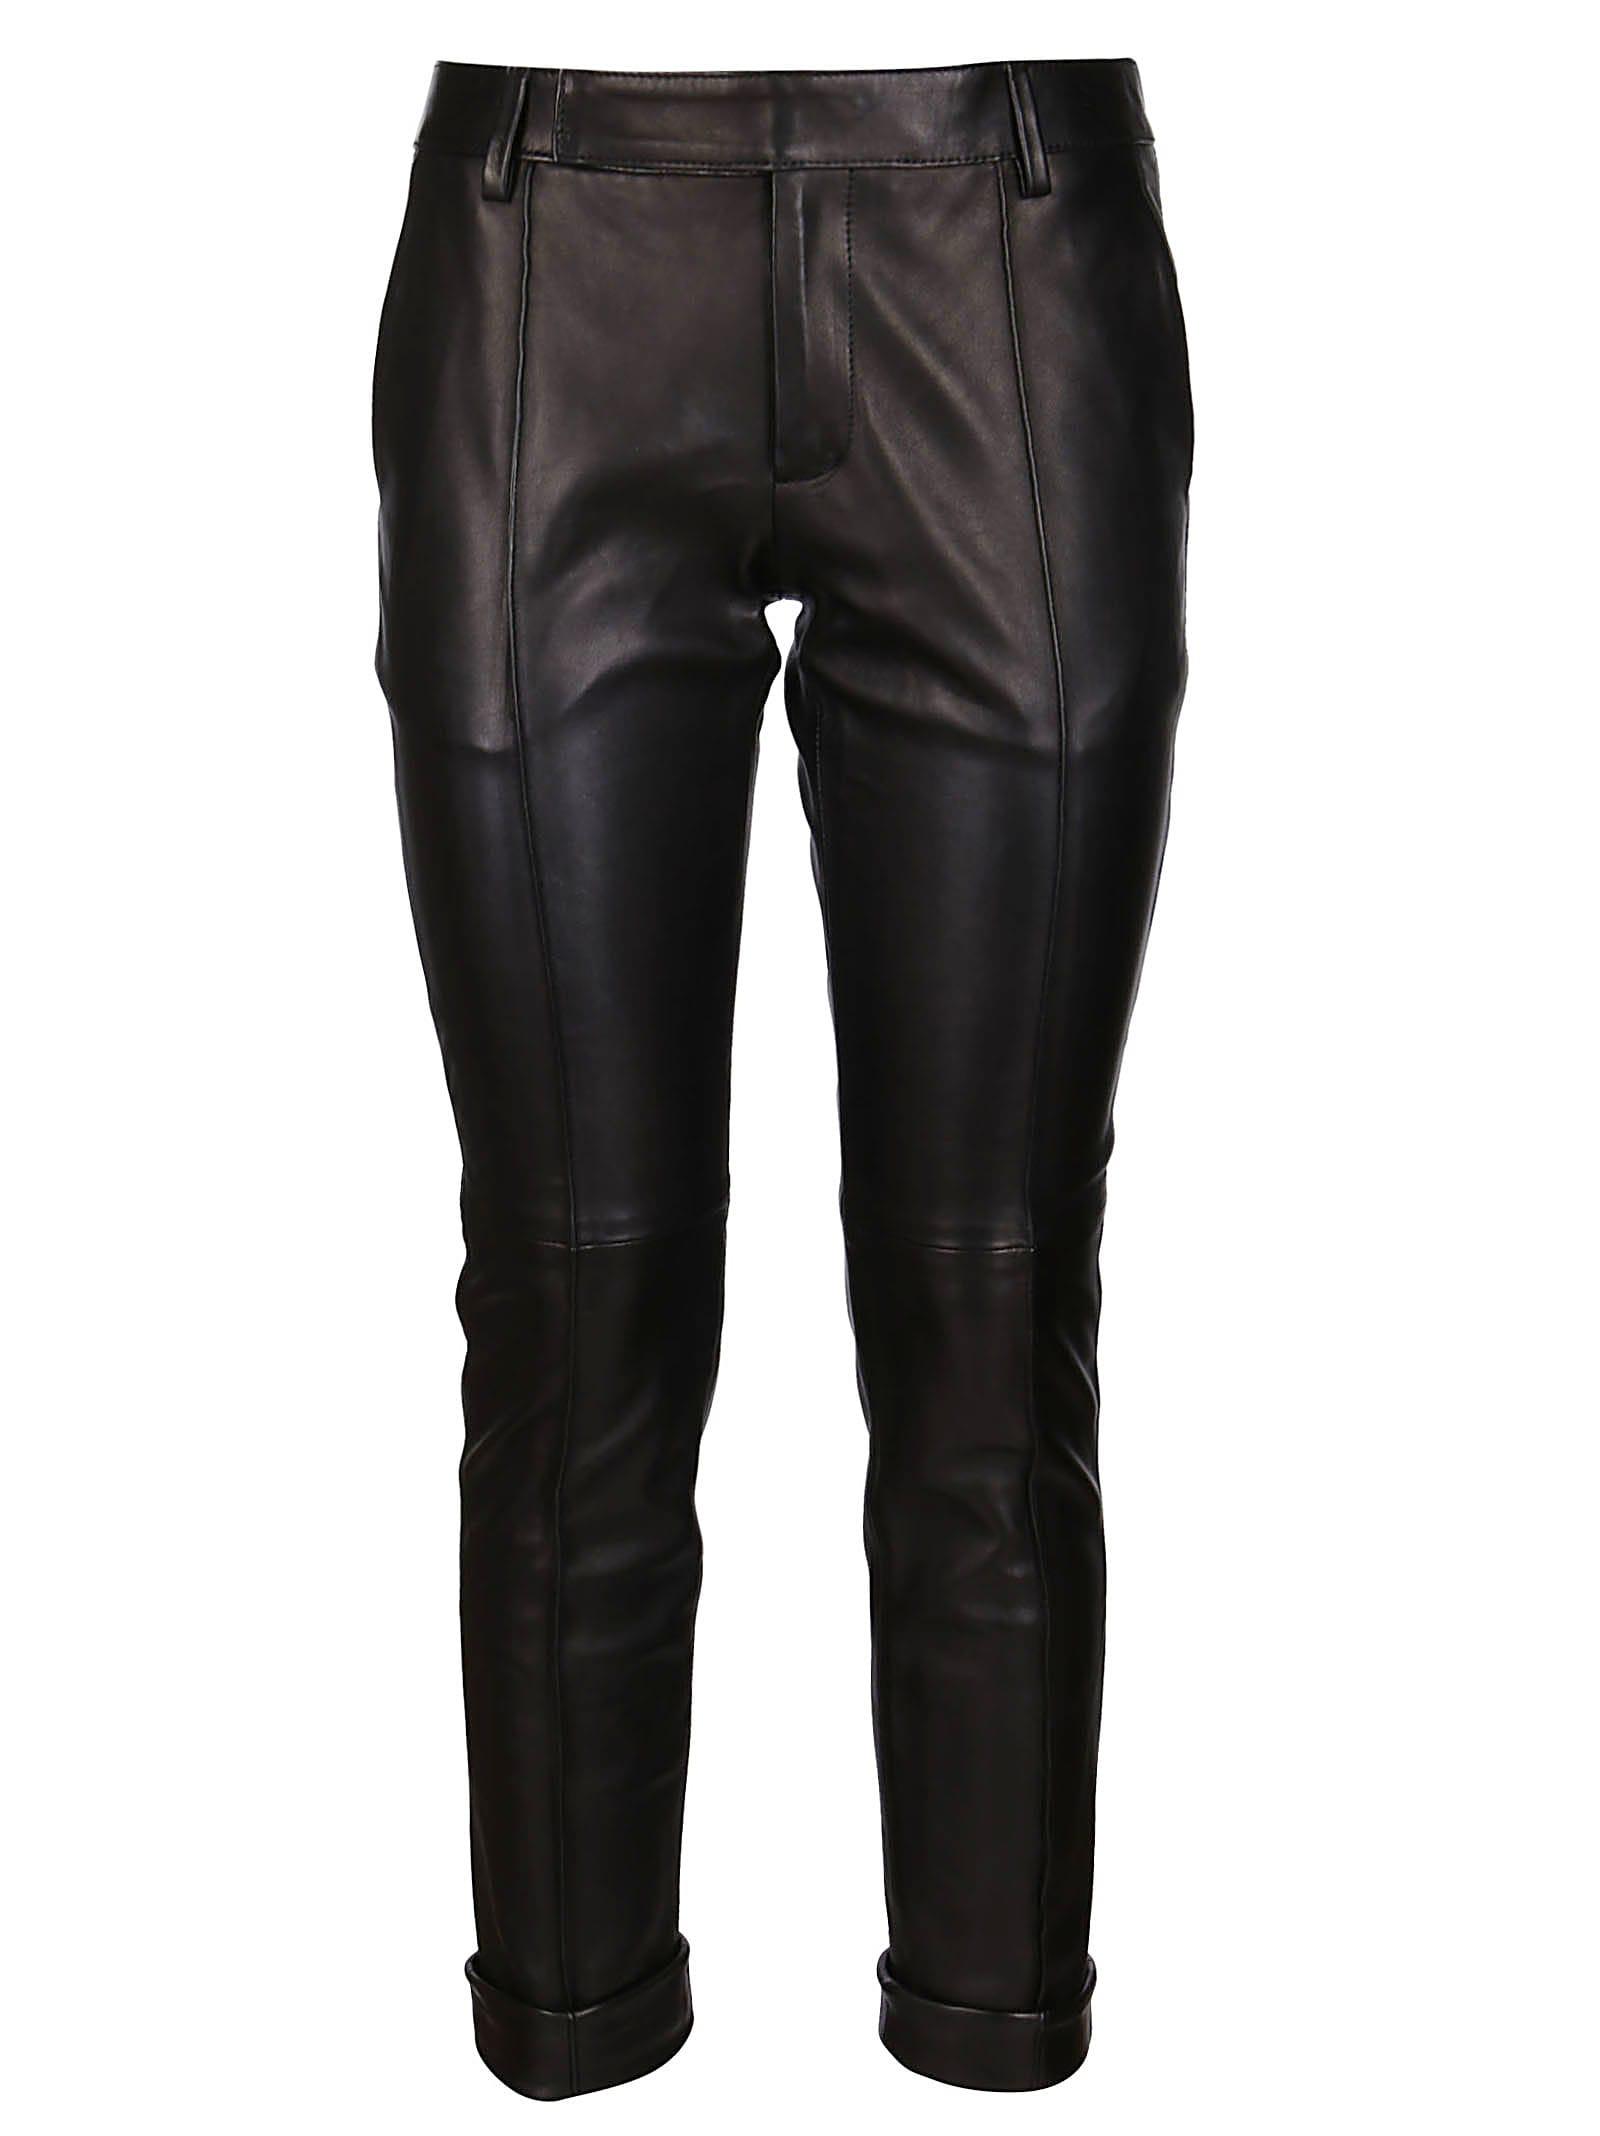 Golden Goose Black Leather Agathe Pant